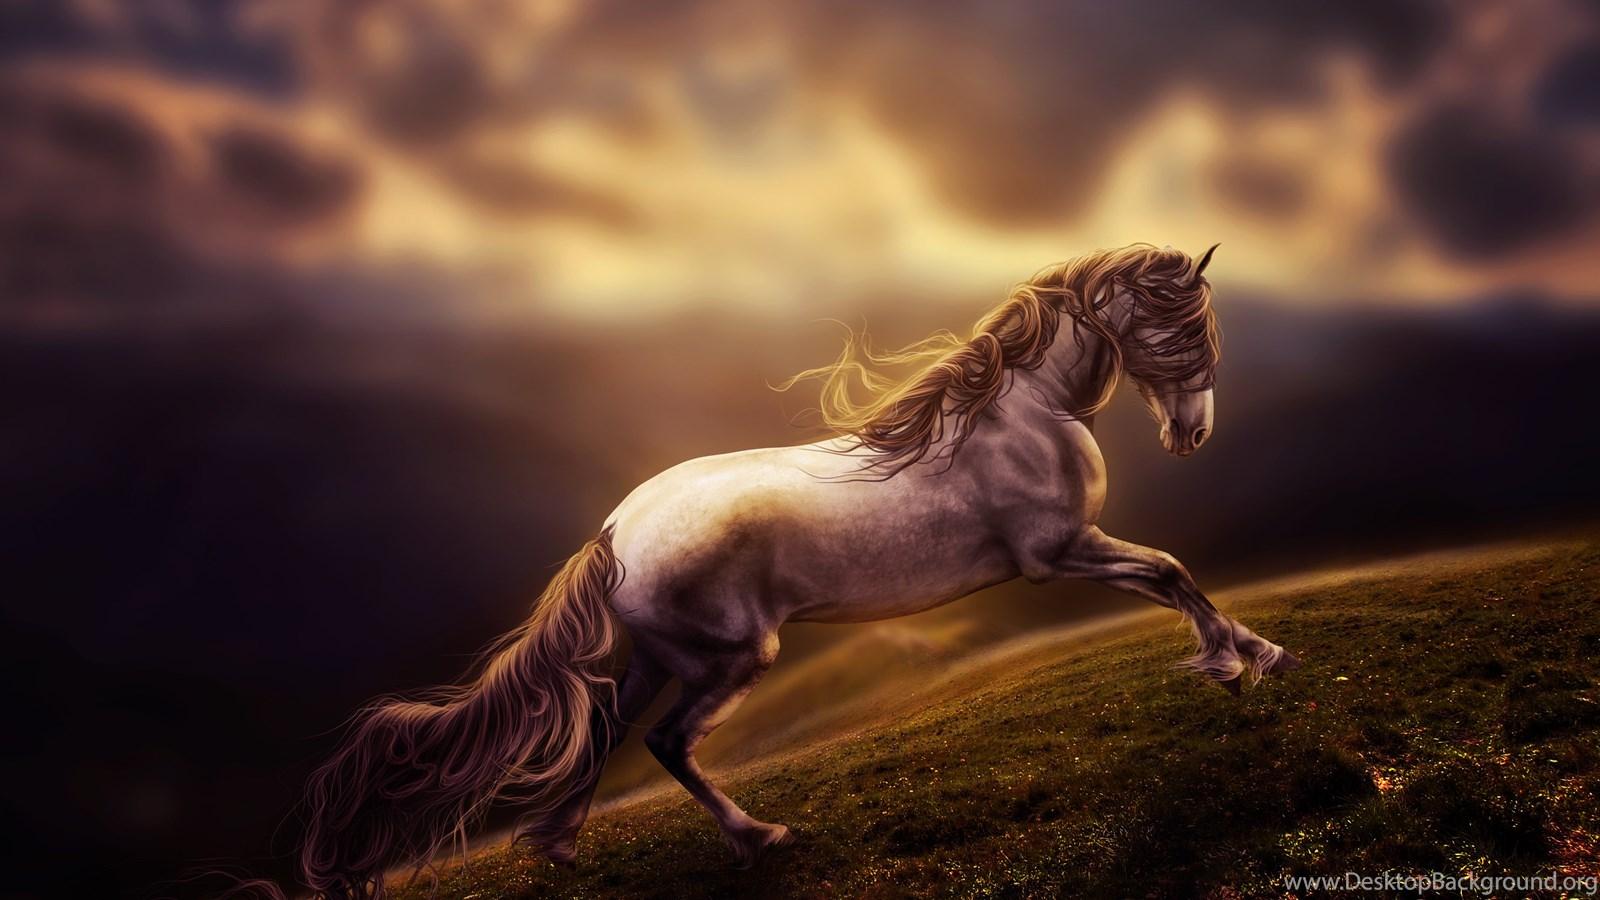 Running horse wallpaper desktop background